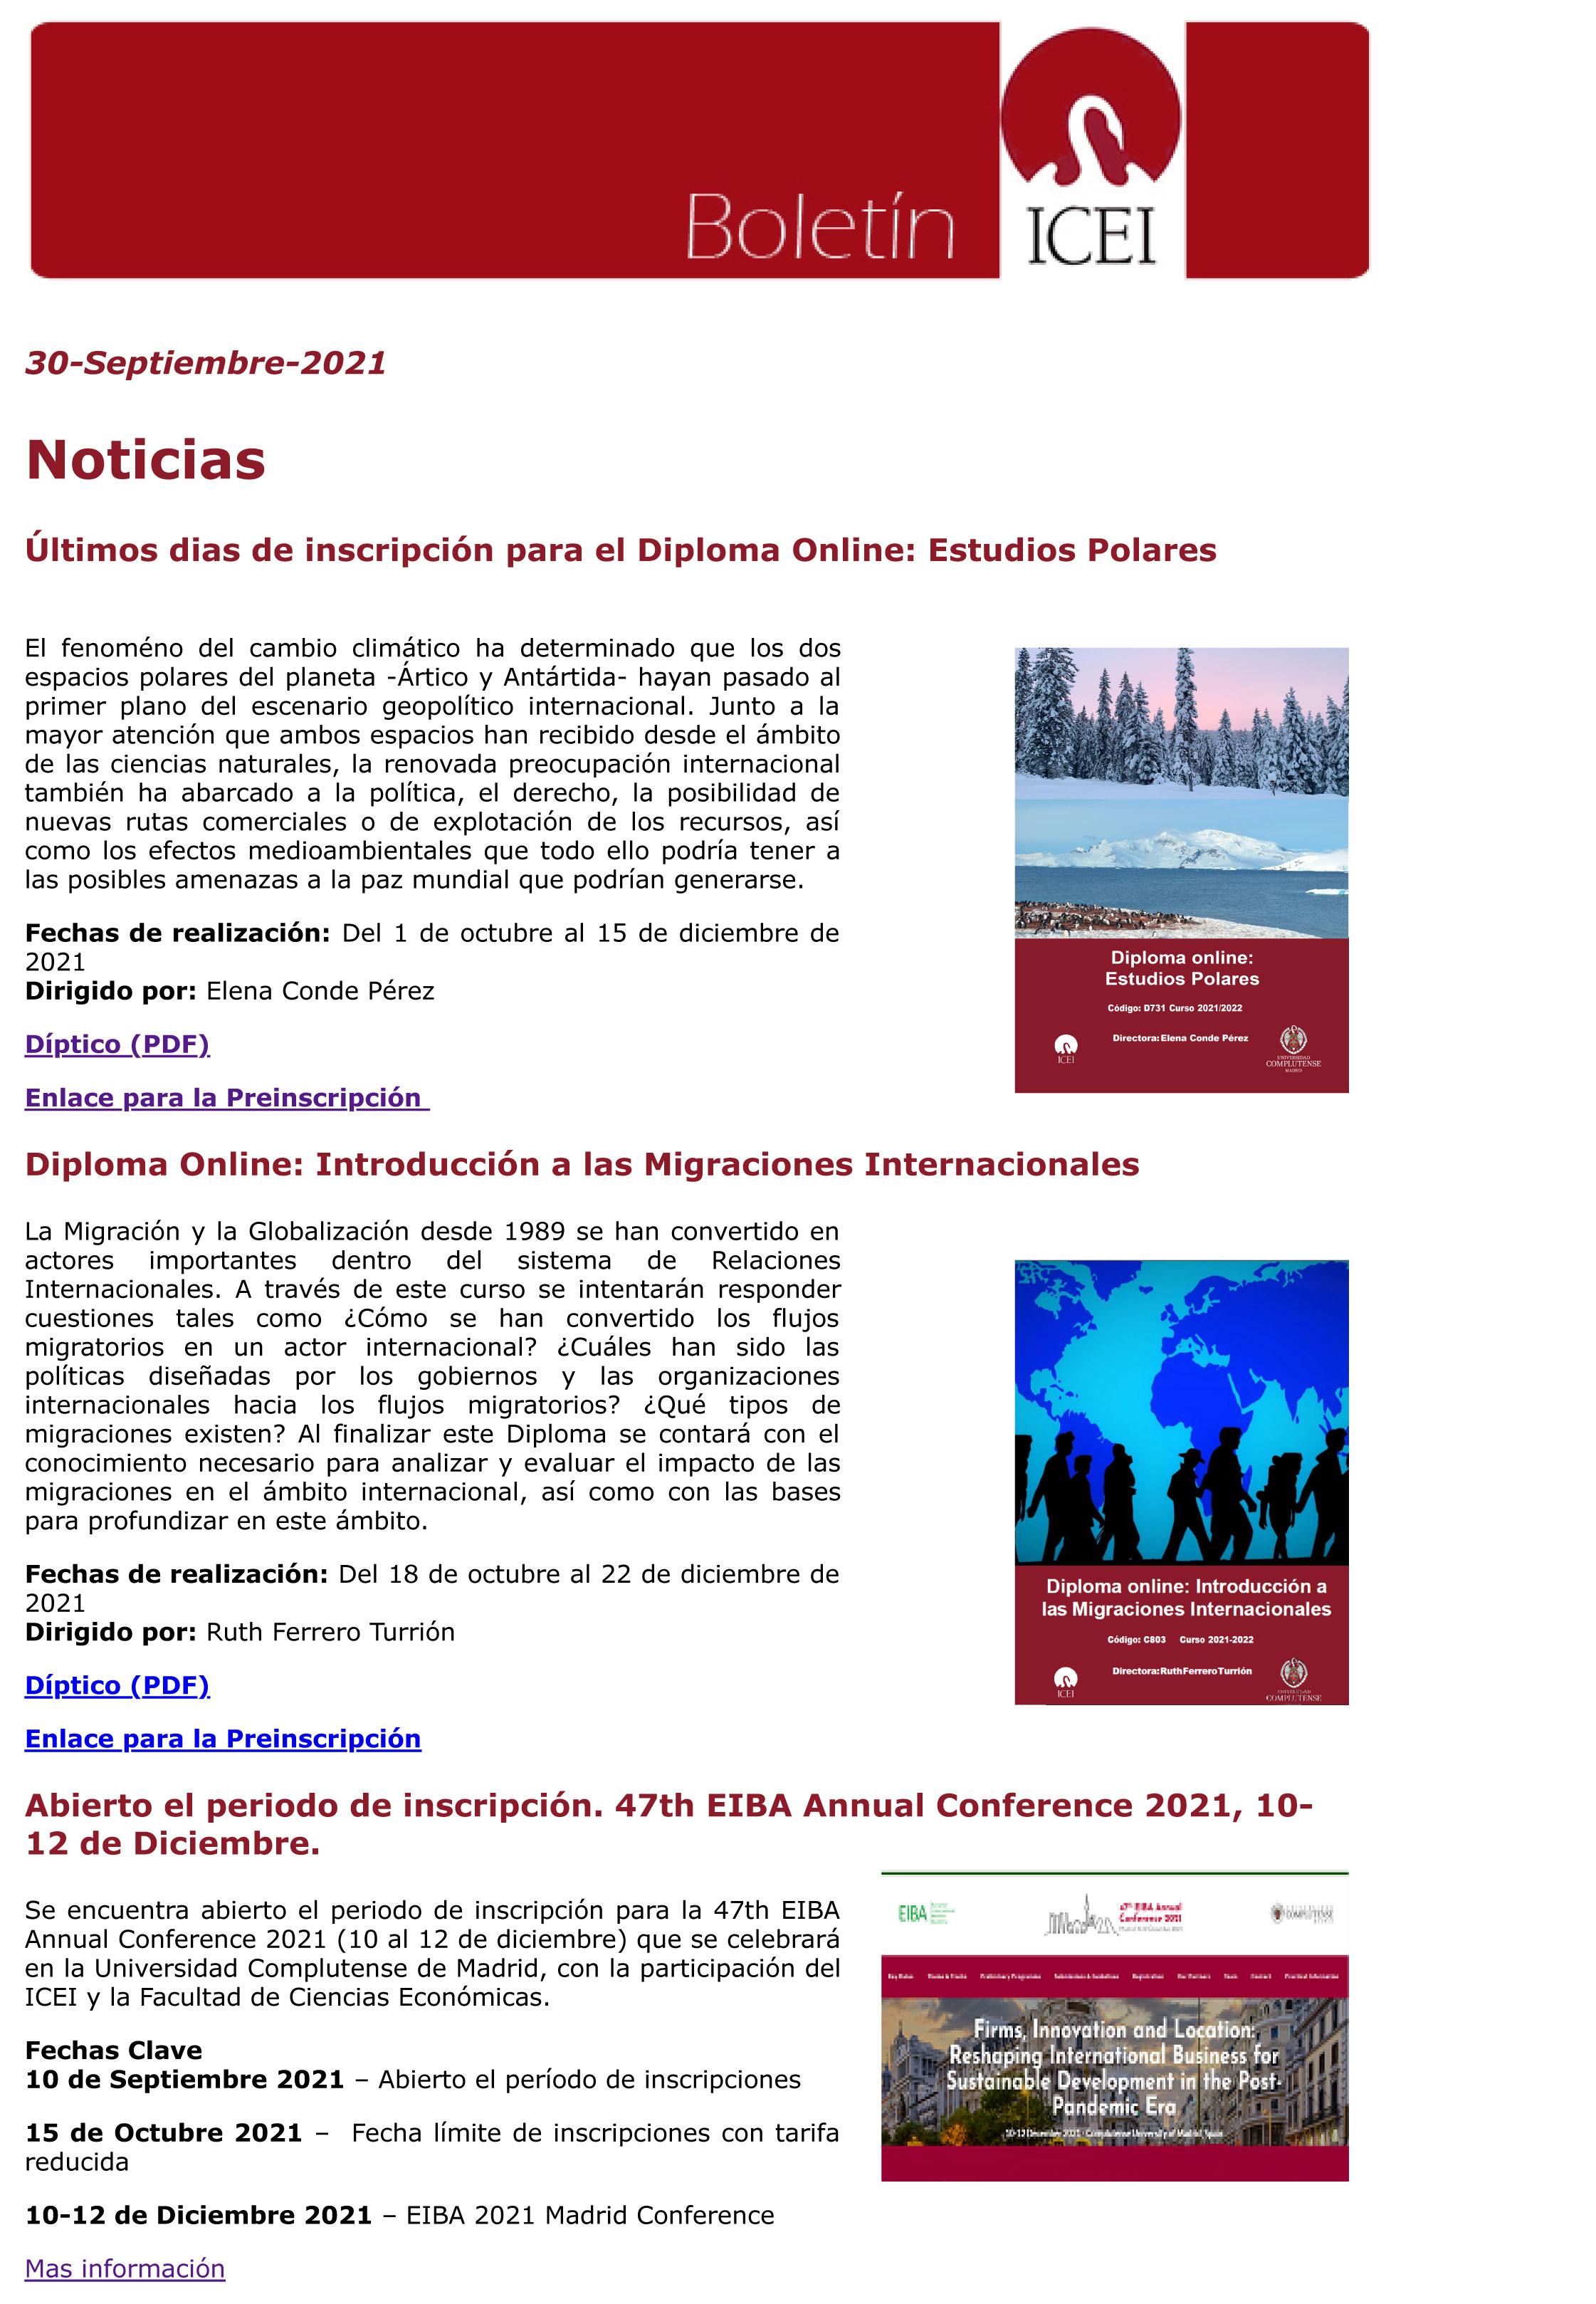 https://www.ucm.es/icei//file/30-09-21?ver